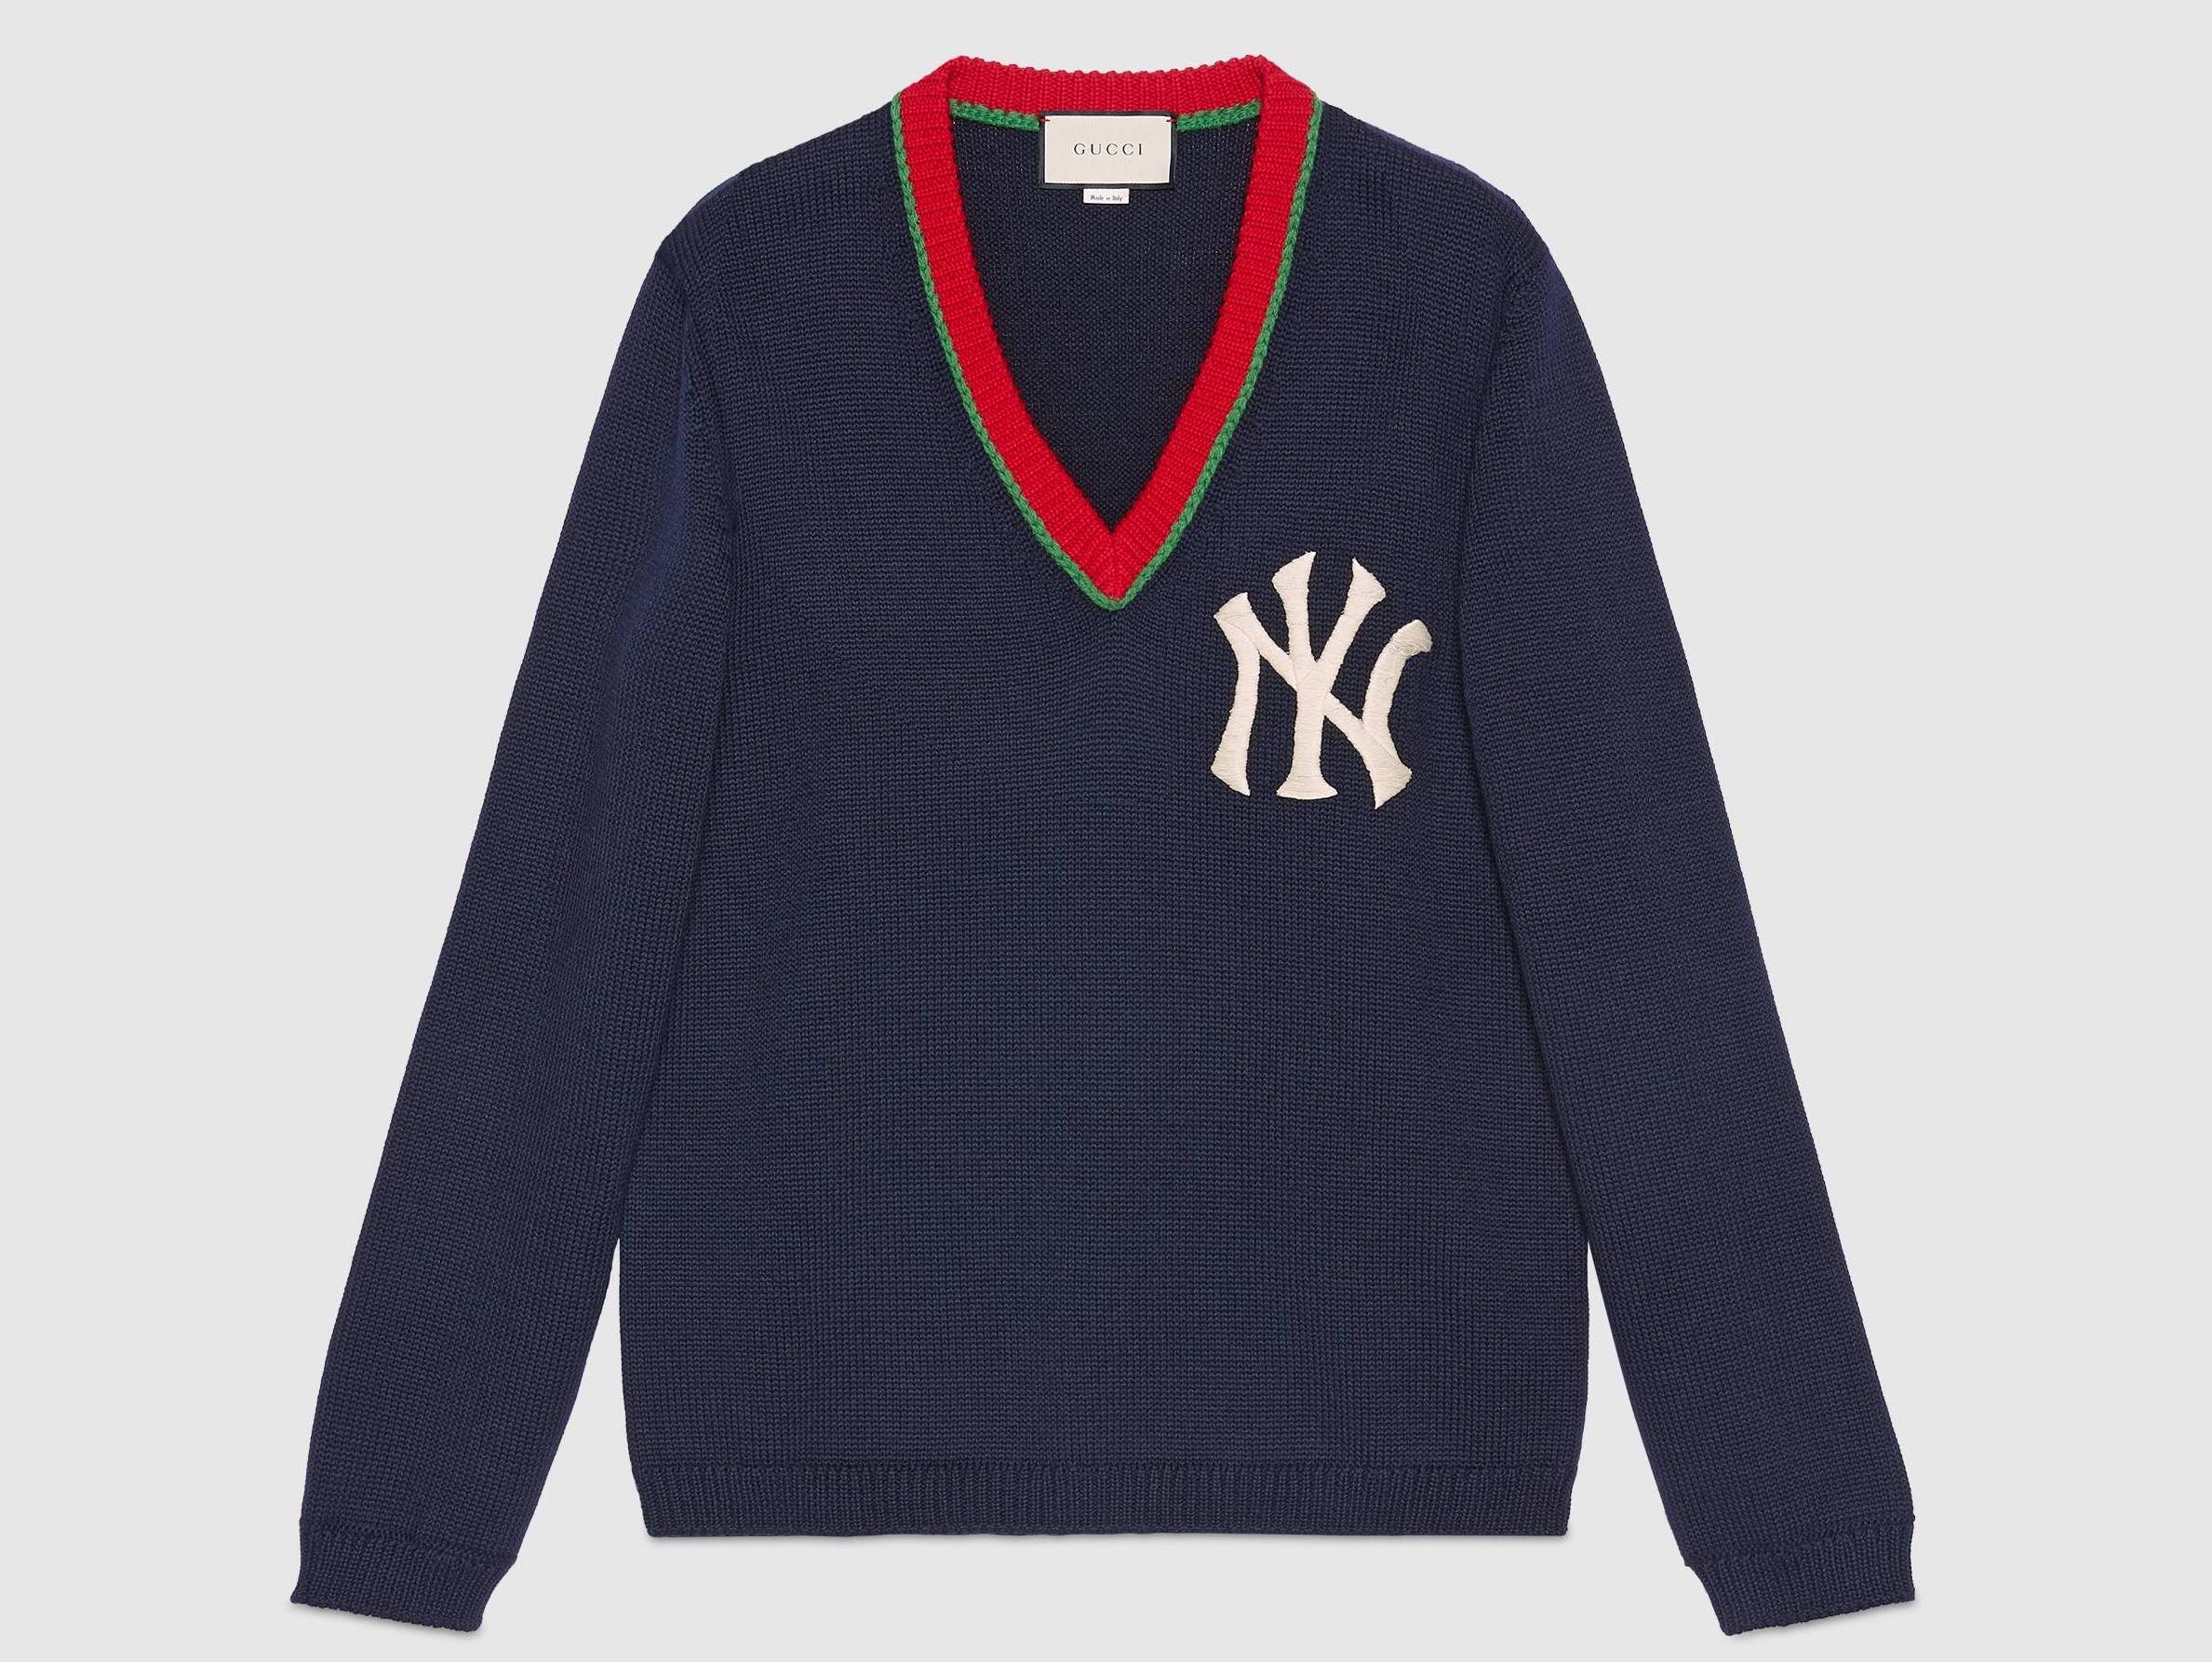 Gucci NY Yankee Sweater